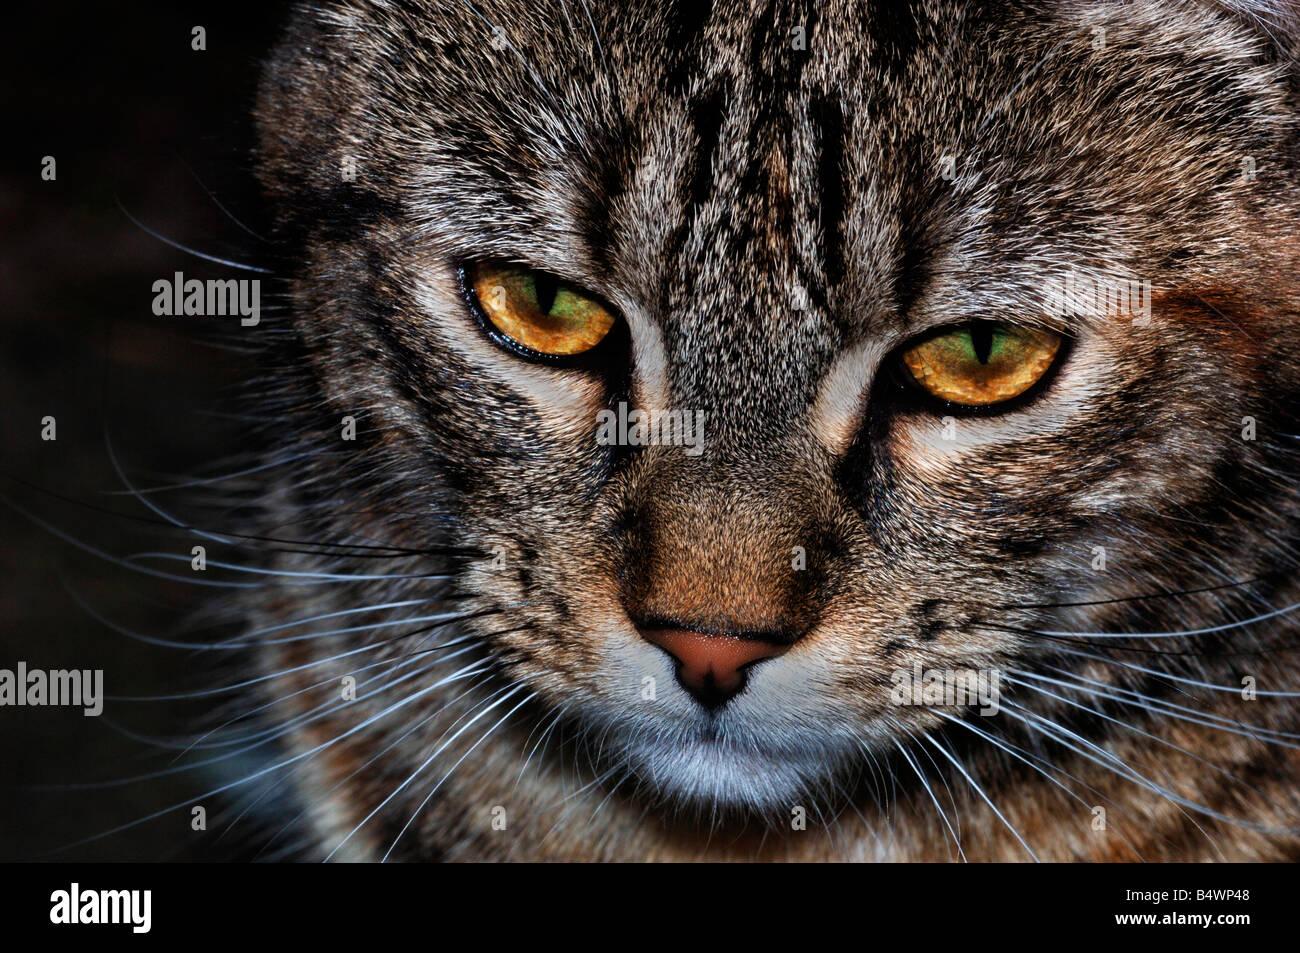 Portrait Of A Female Domestic Cat - Stock Image